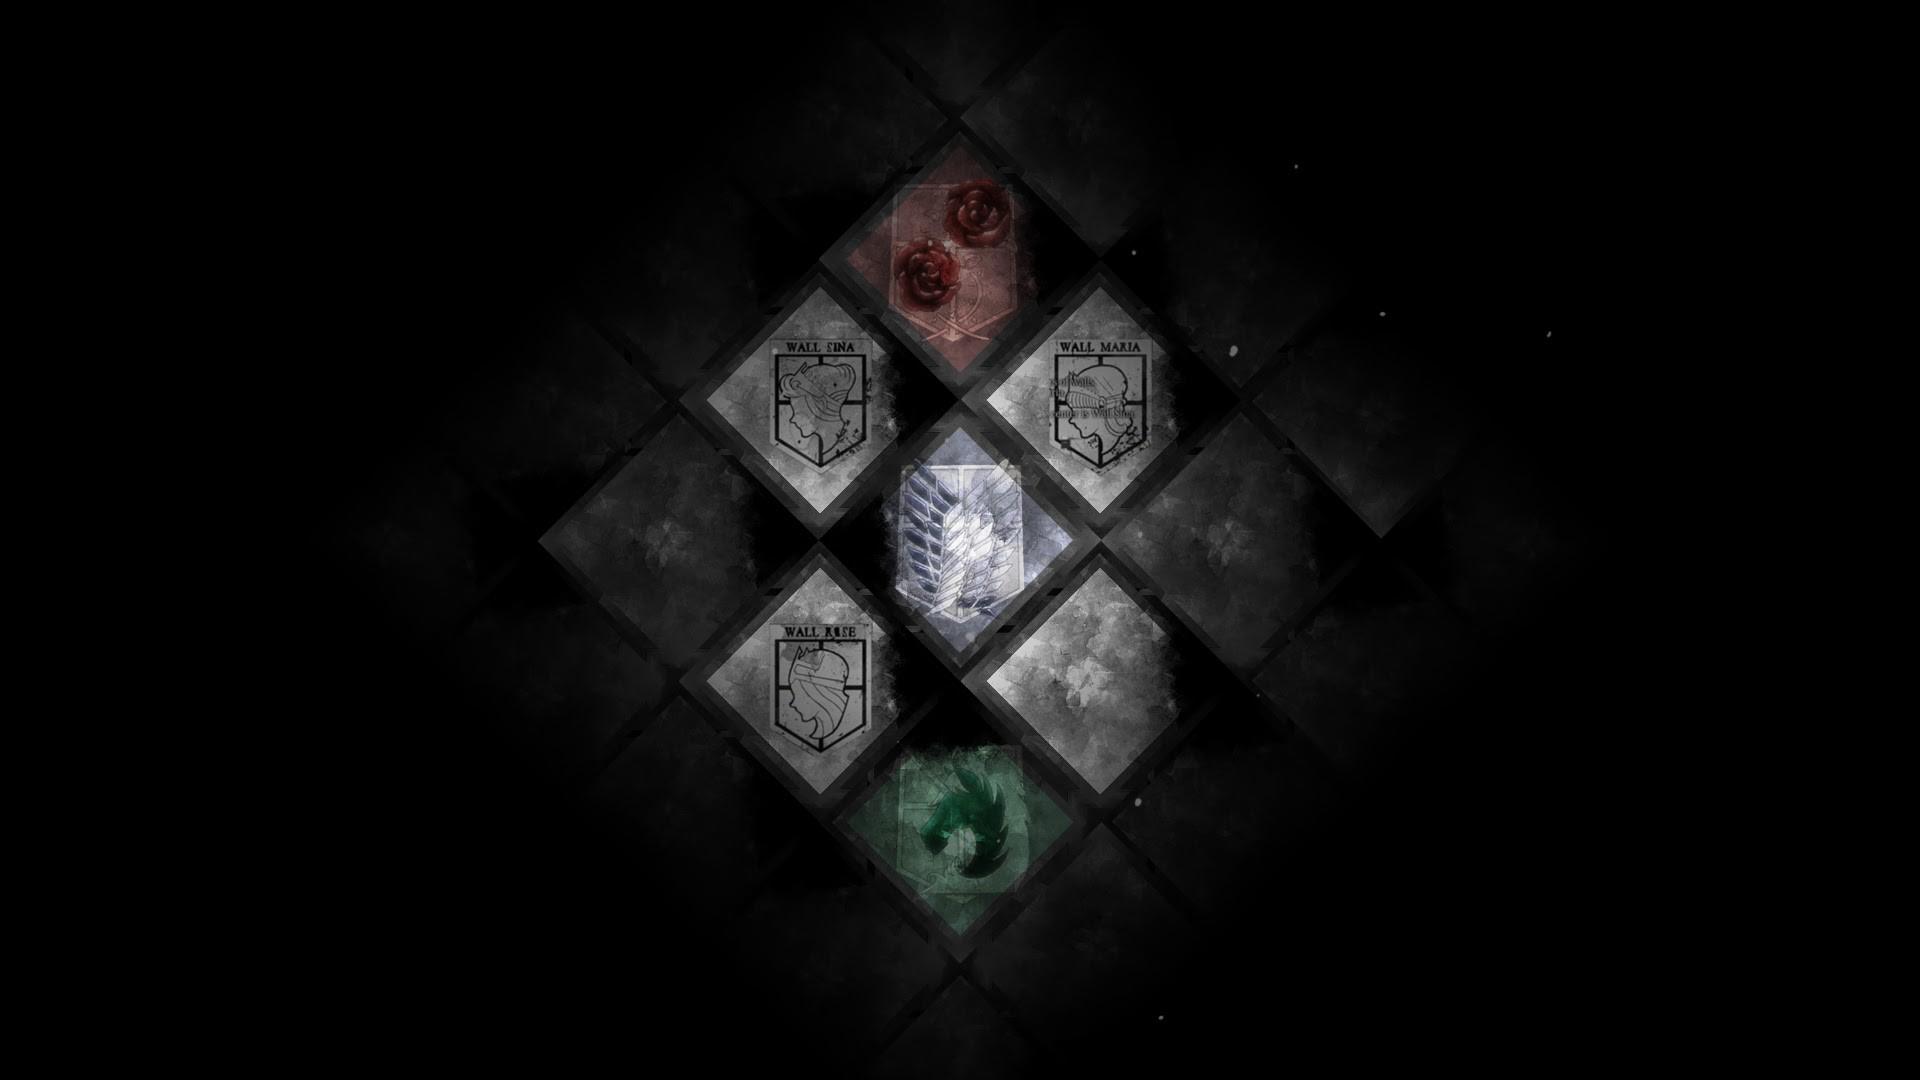 attack on titan emblem flags Attack On Titan Wallpaper Hd Scouting Legion